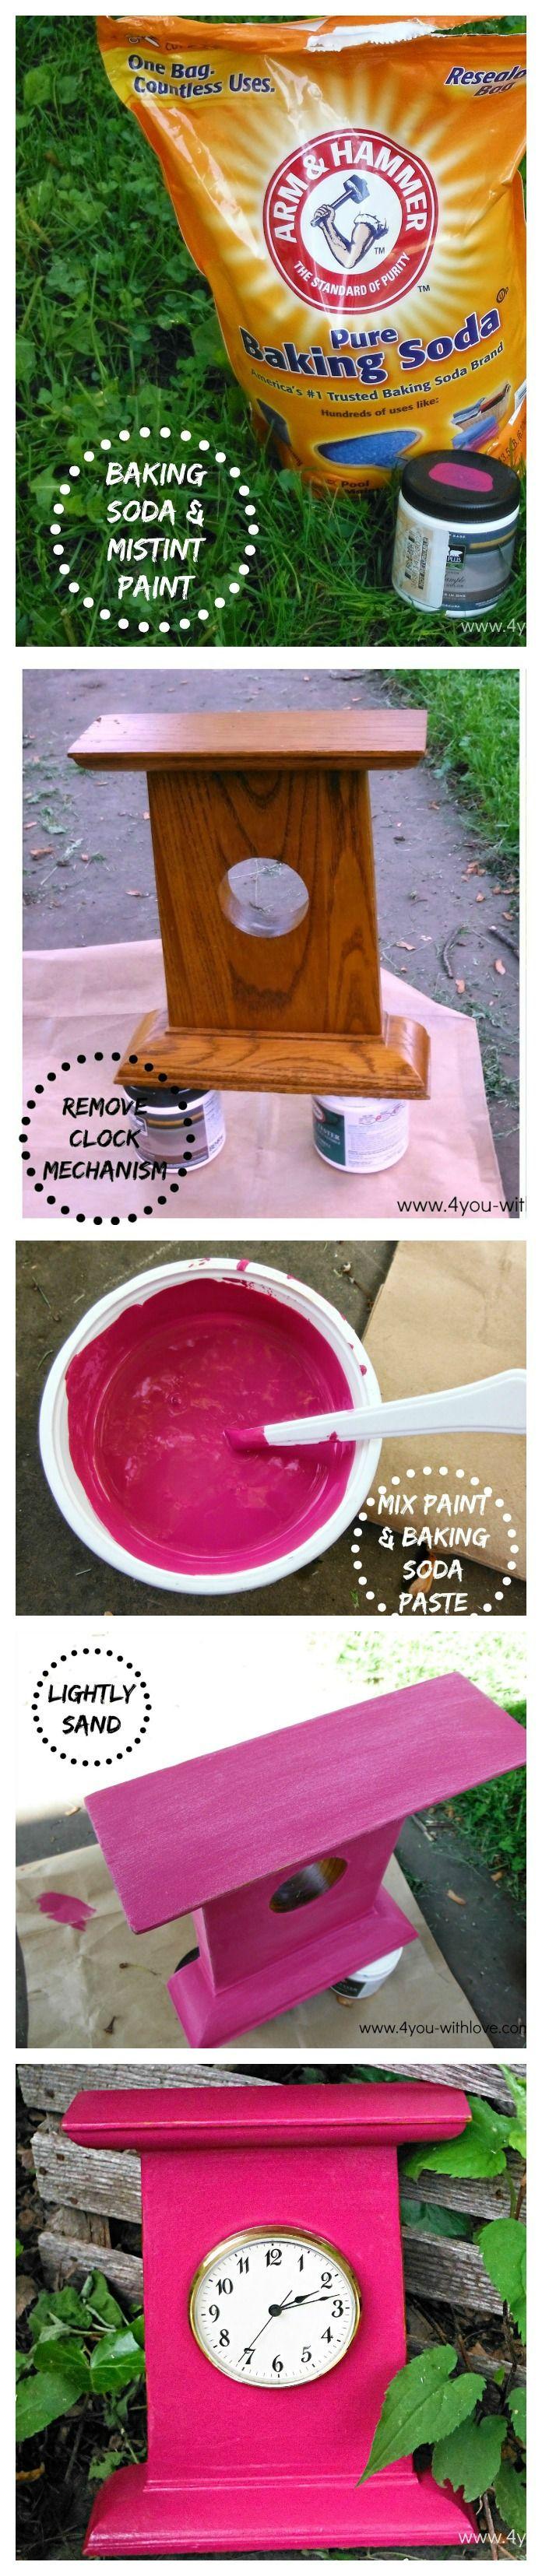 DIY Challk Paint Tutorial